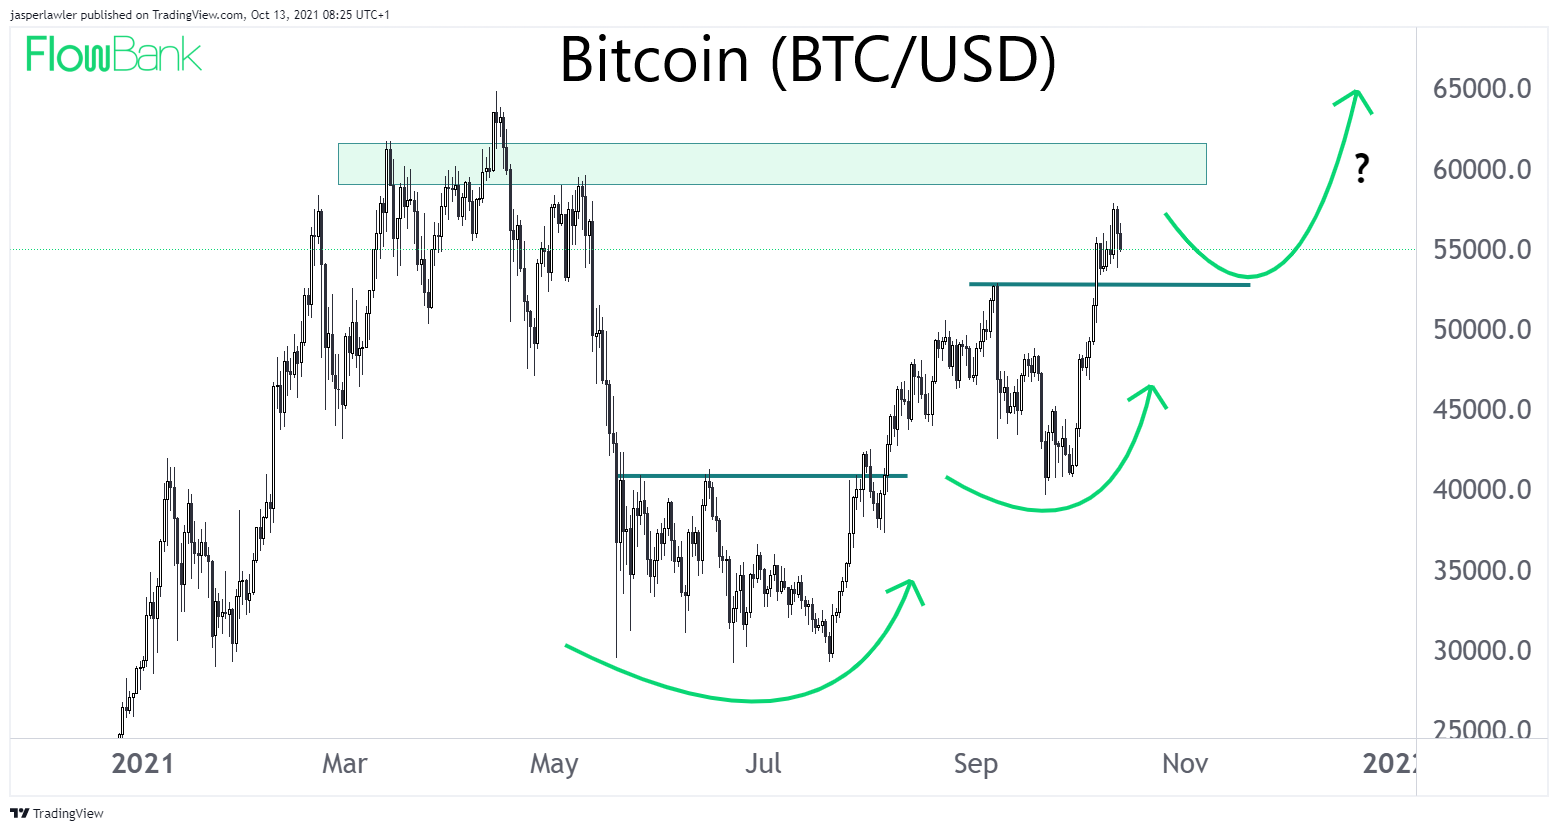 BTC/USD Bitcoin price chart 1 year